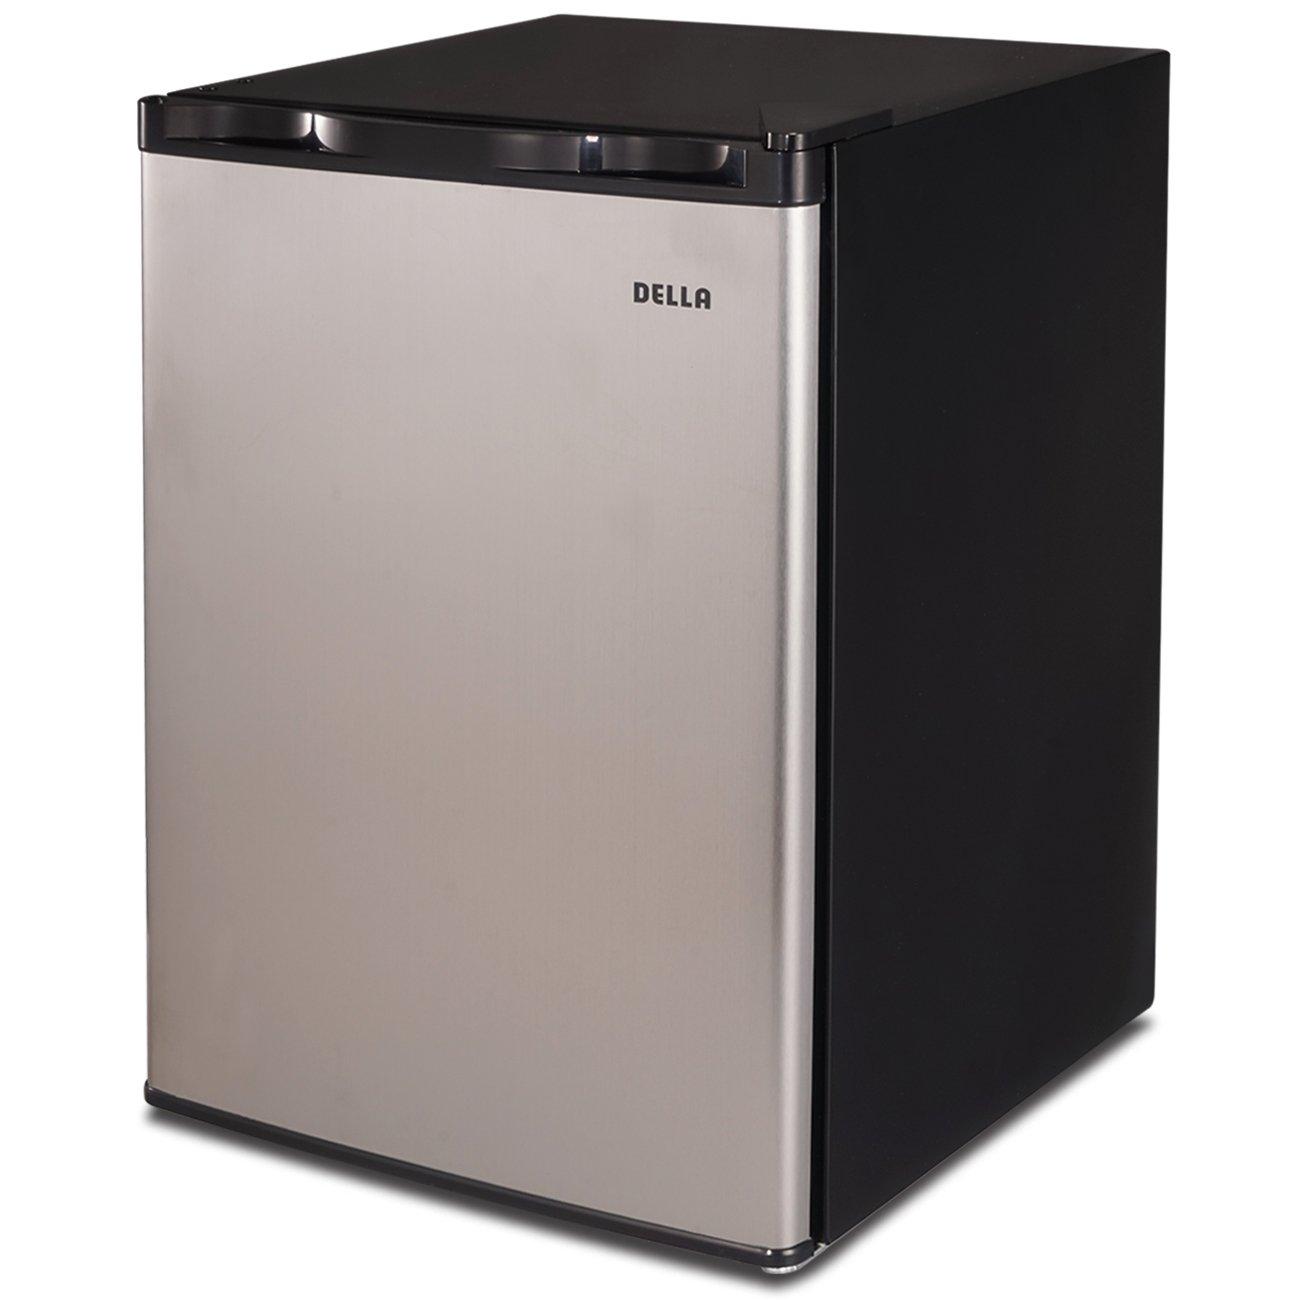 mini fridge office. Amazon.com: Della Mini Refrigerator Freezer Dorm Fridge 2.6 Cu Ft Office Compact Room Beer Cooler, Stainless Steel: Appliances Y